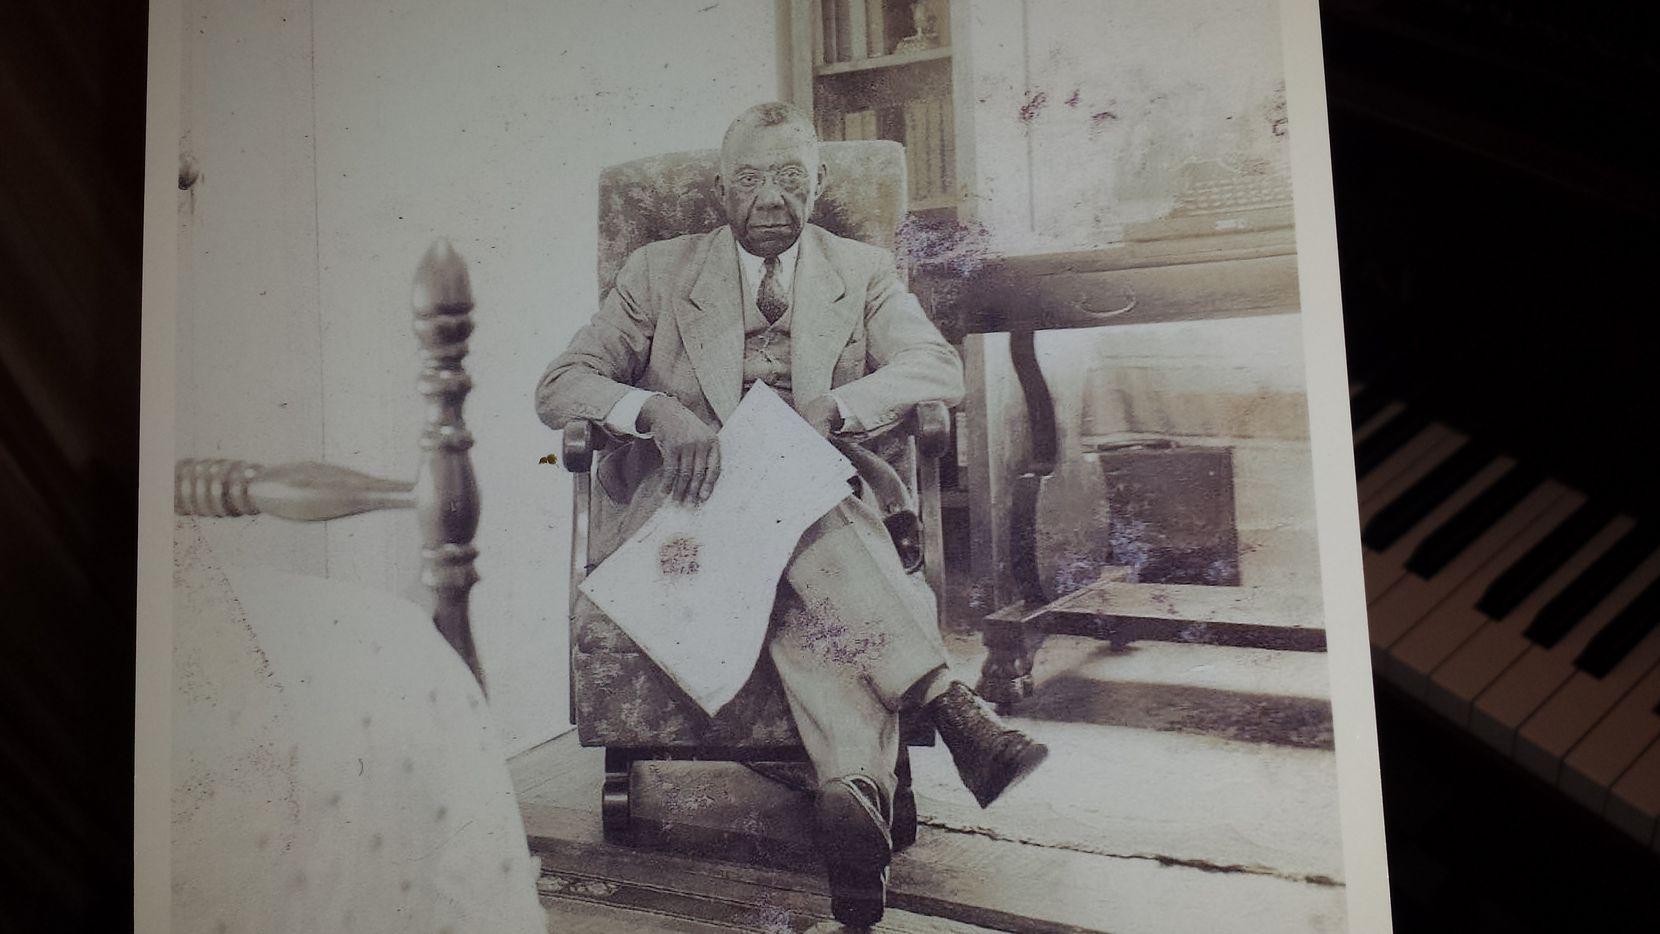 J.L. Turner Sr.